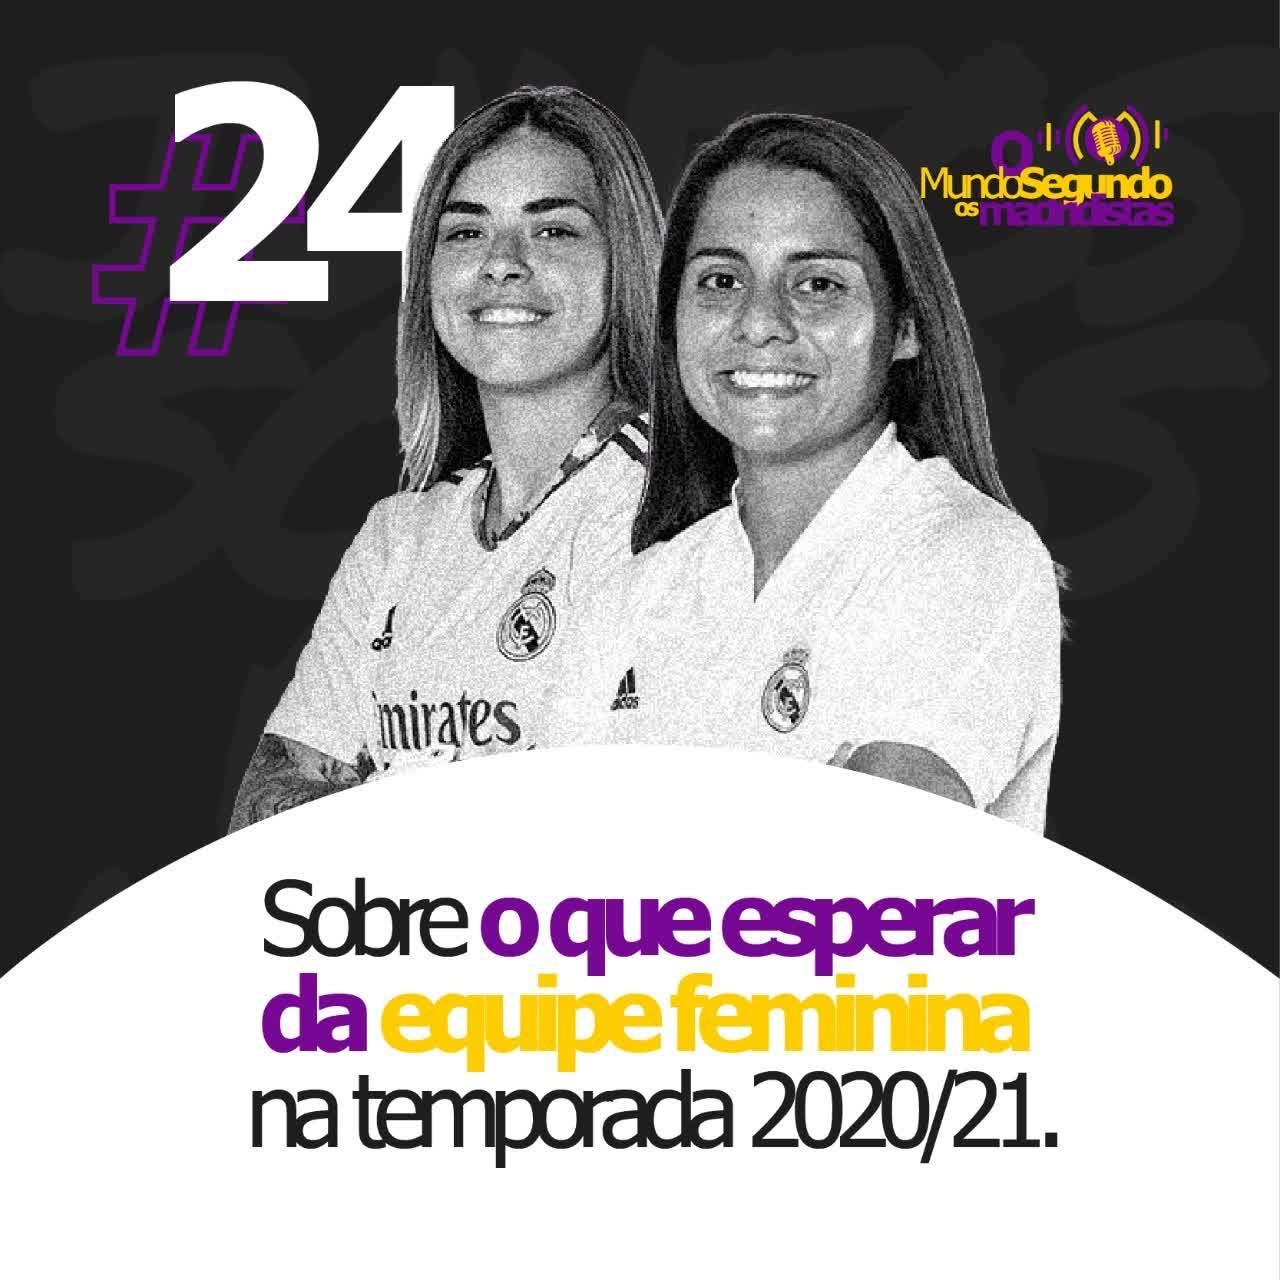 Ep 24 - Sobre o que esperar do time feminino na primeira temporada